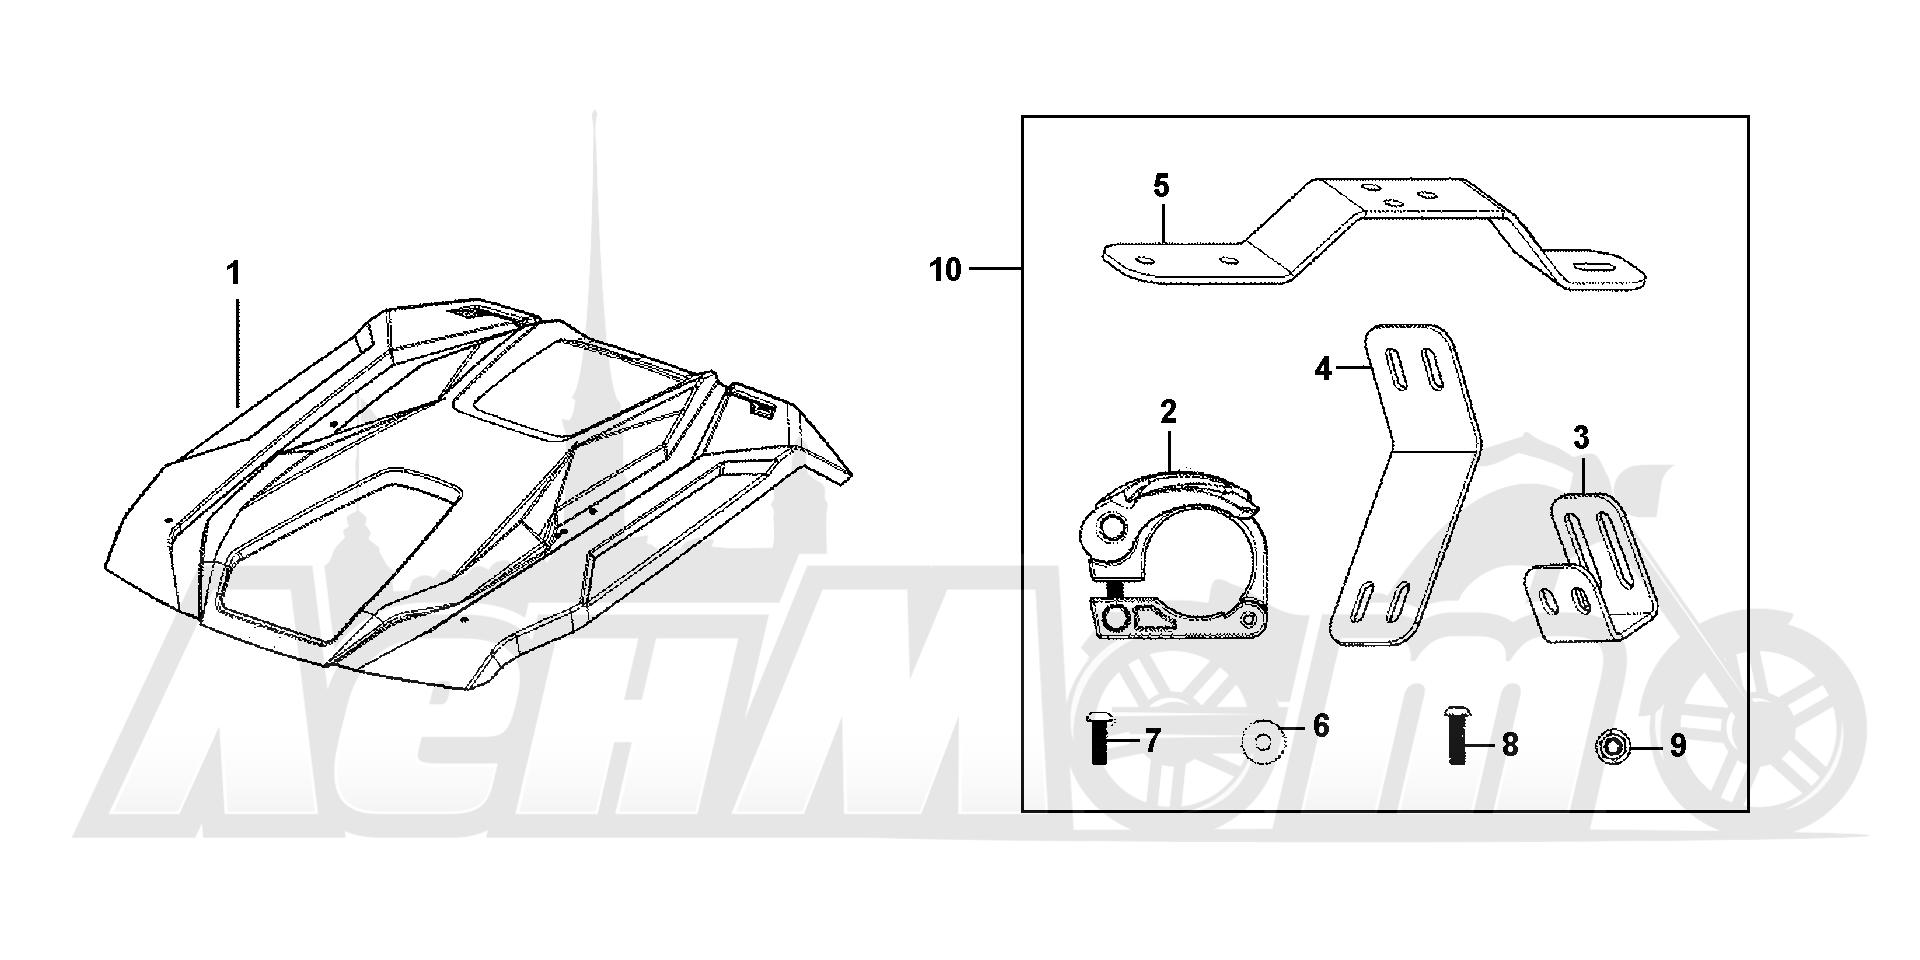 Запчасти для Квадроцикла Honda 2019 SXS1000M5D Раздел: HARD ROOF (5P) | HARD крыша (5P)